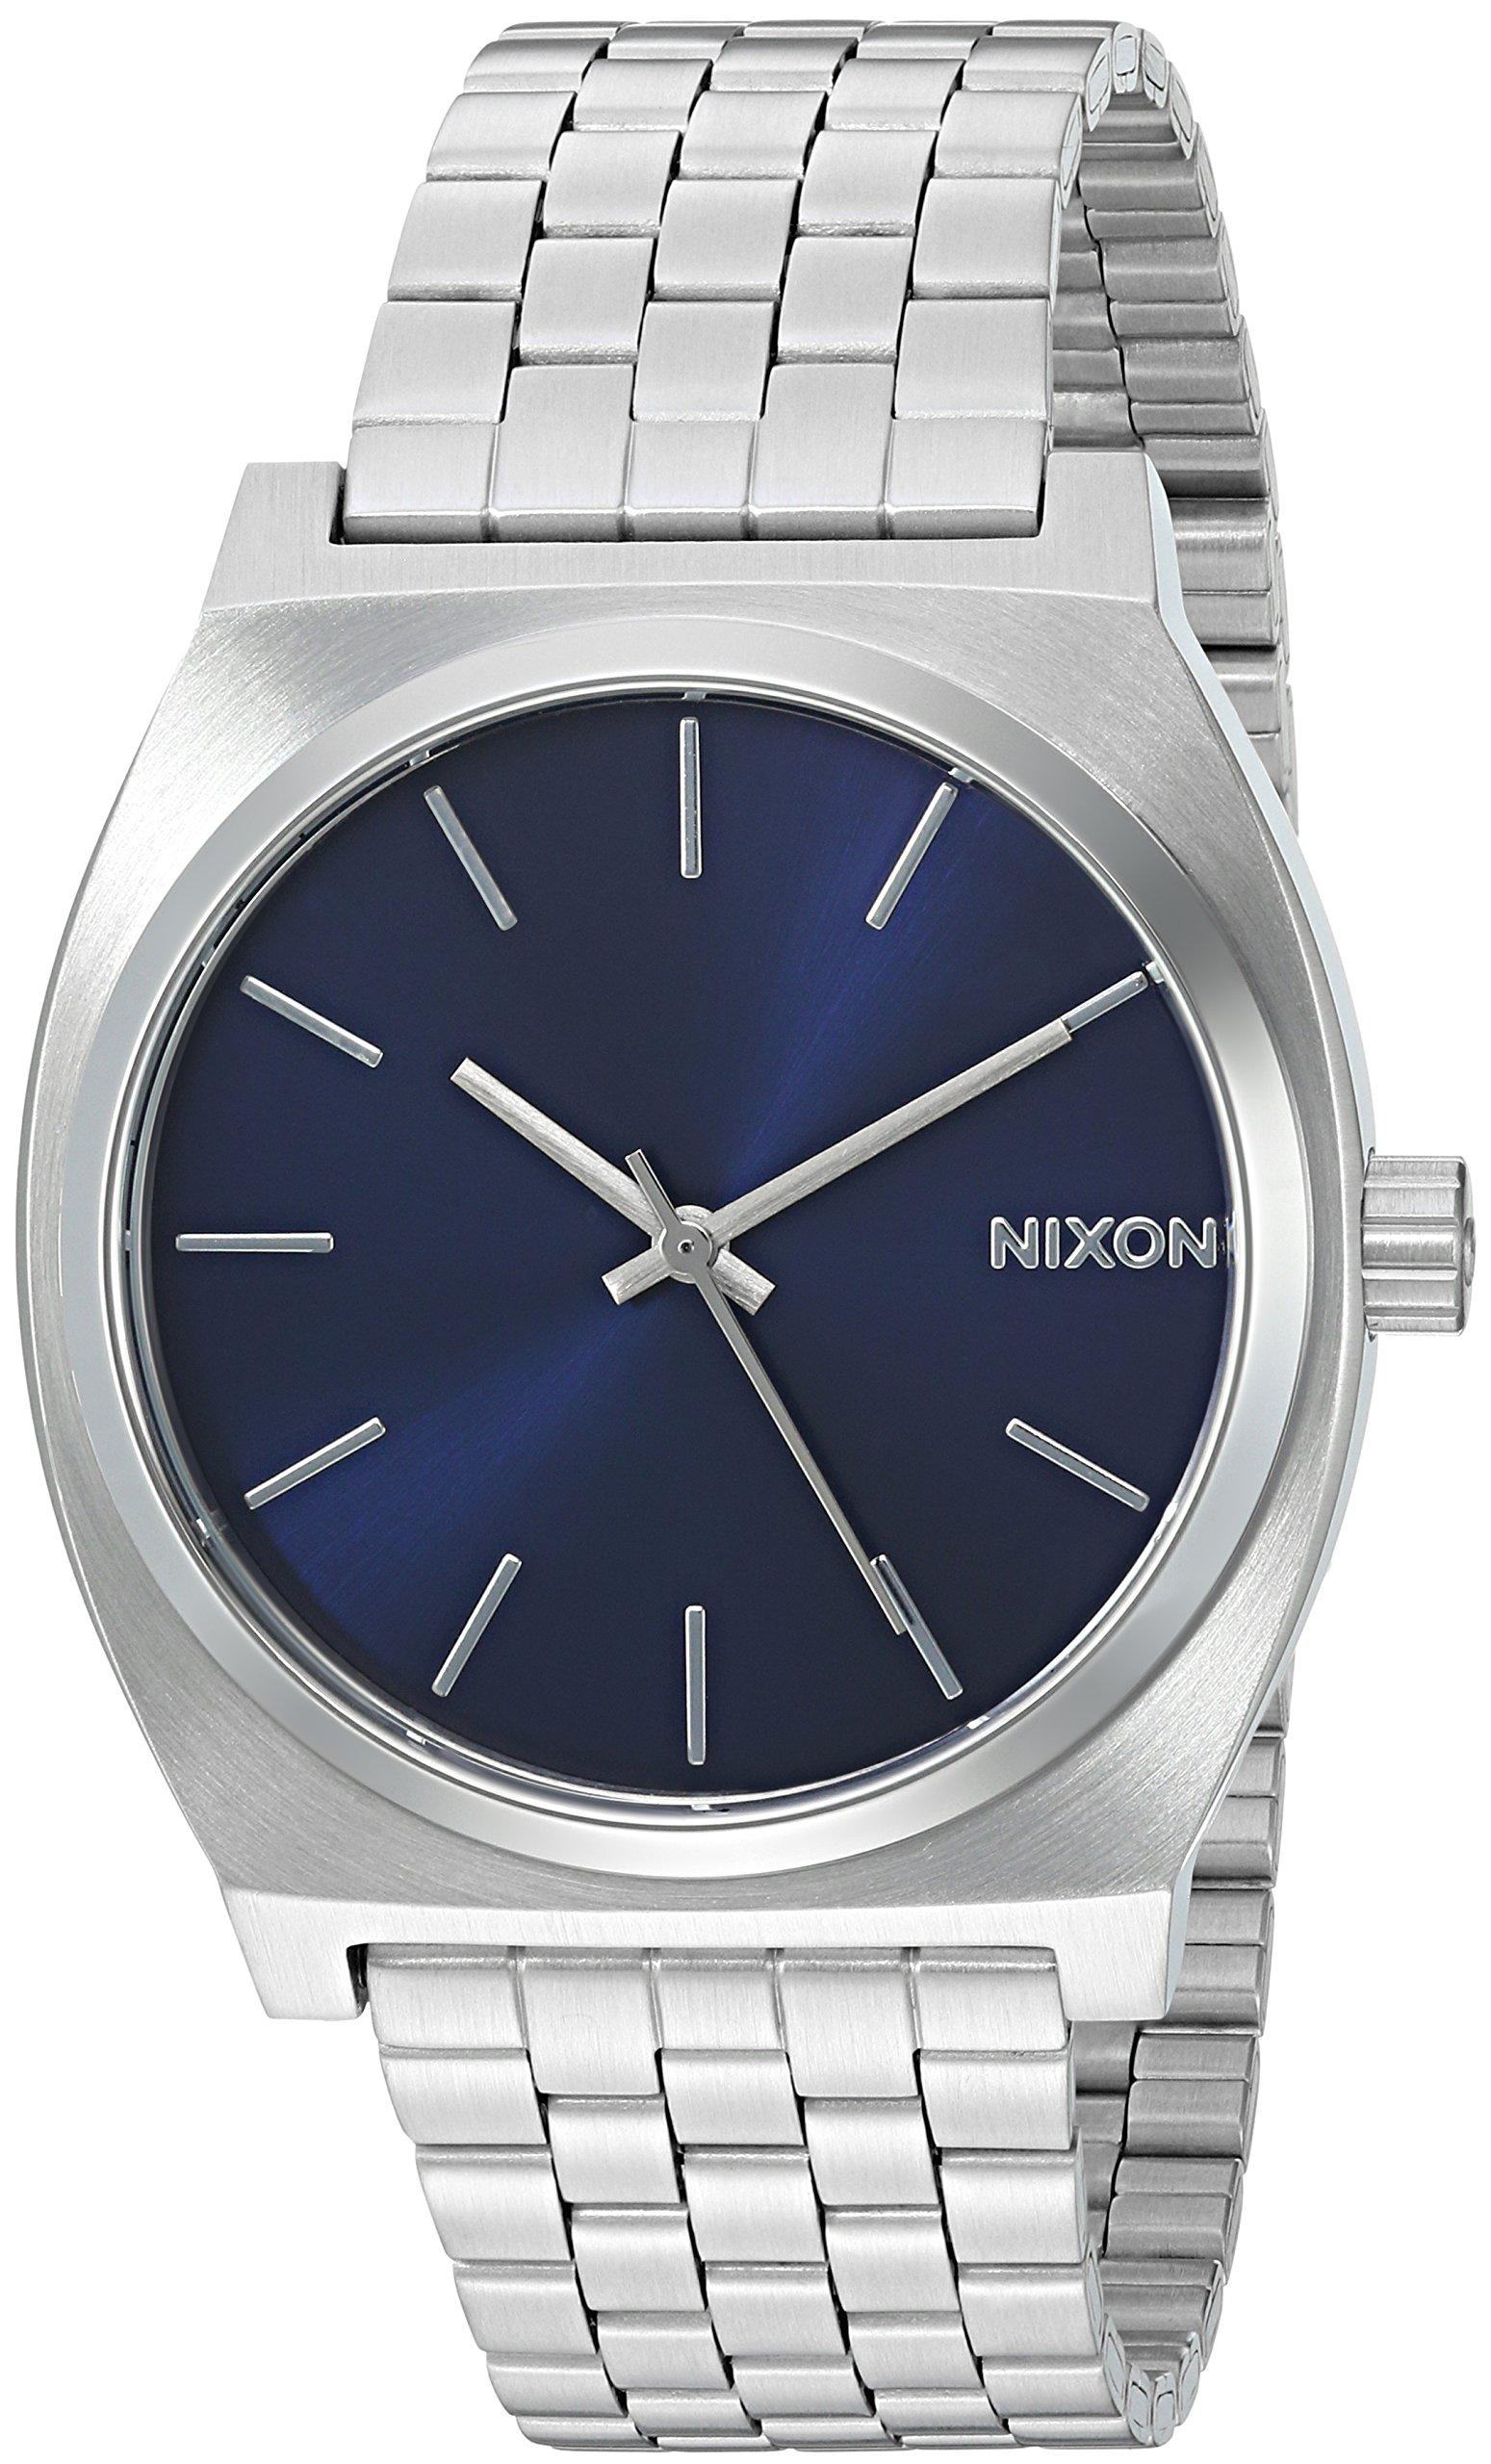 Nixon Time Tellerクォーツウォッチファッションエレガントニュートラルウォッチ